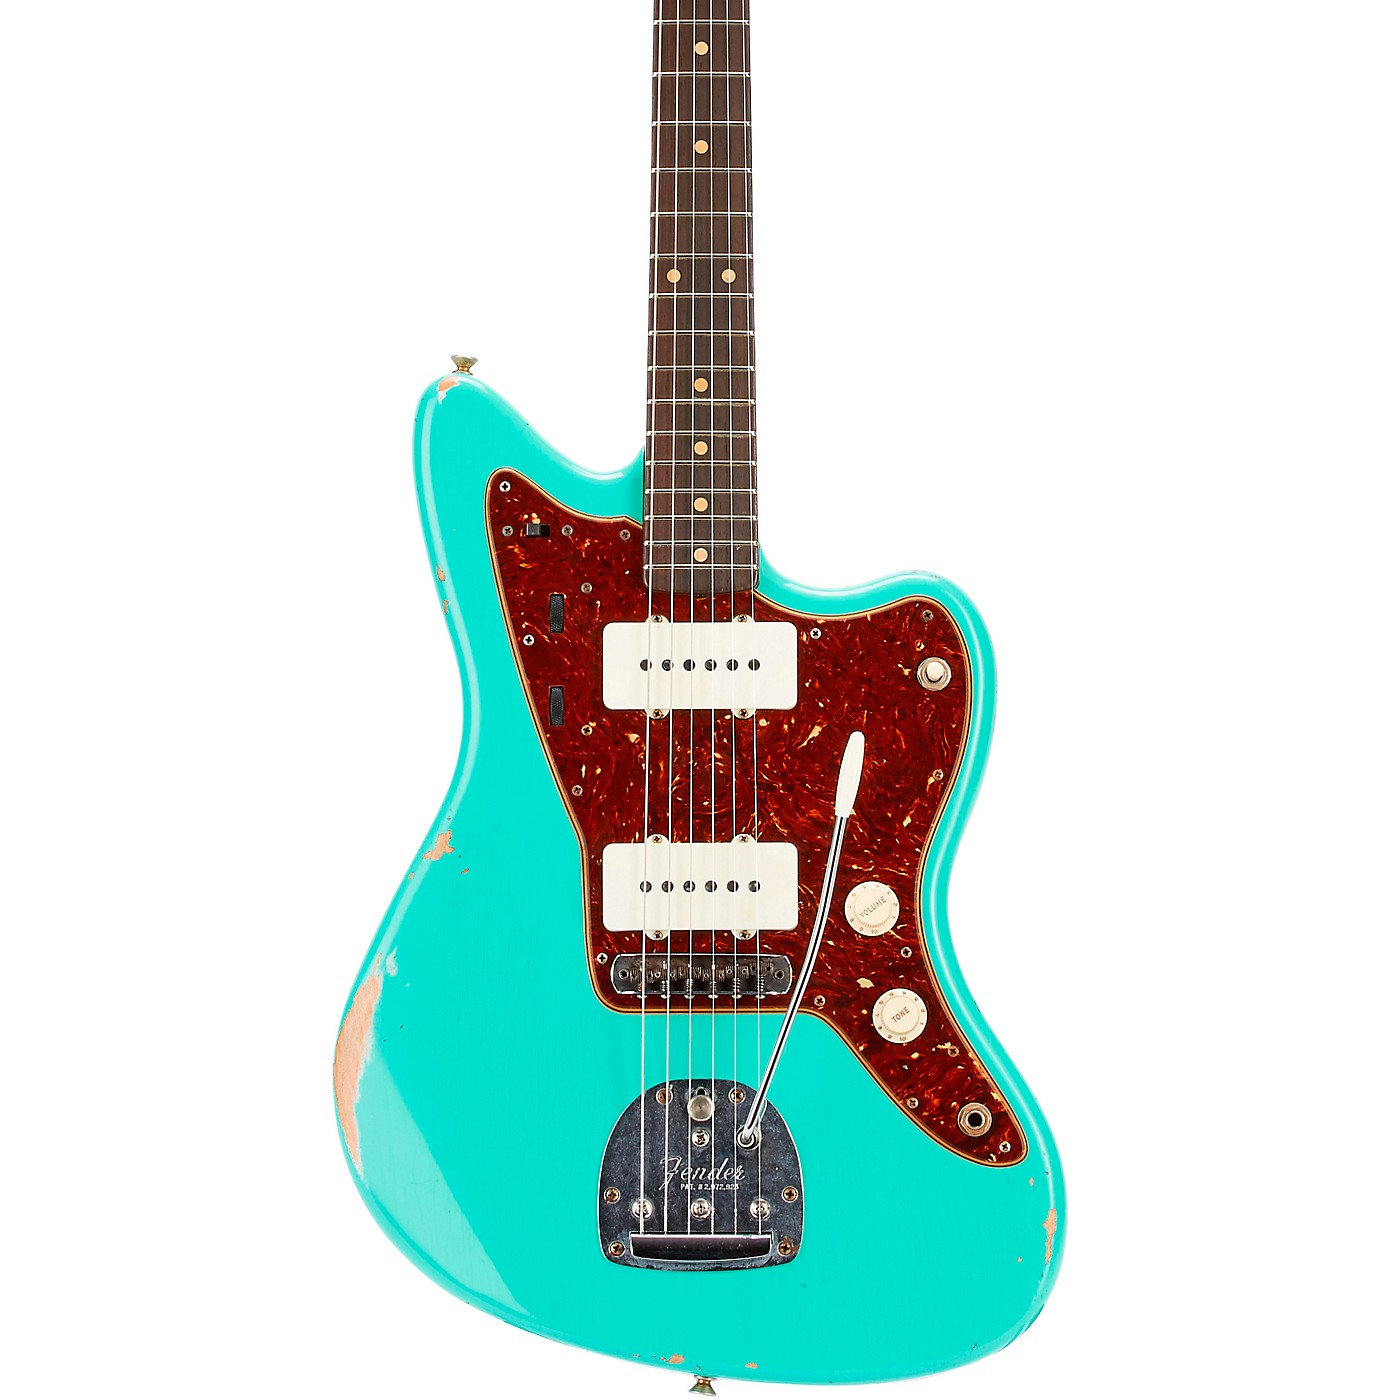 Fender Custom Shop 62 Jazzmaster Relic Rosewood Fingerboard Electric Guitar thumbnail